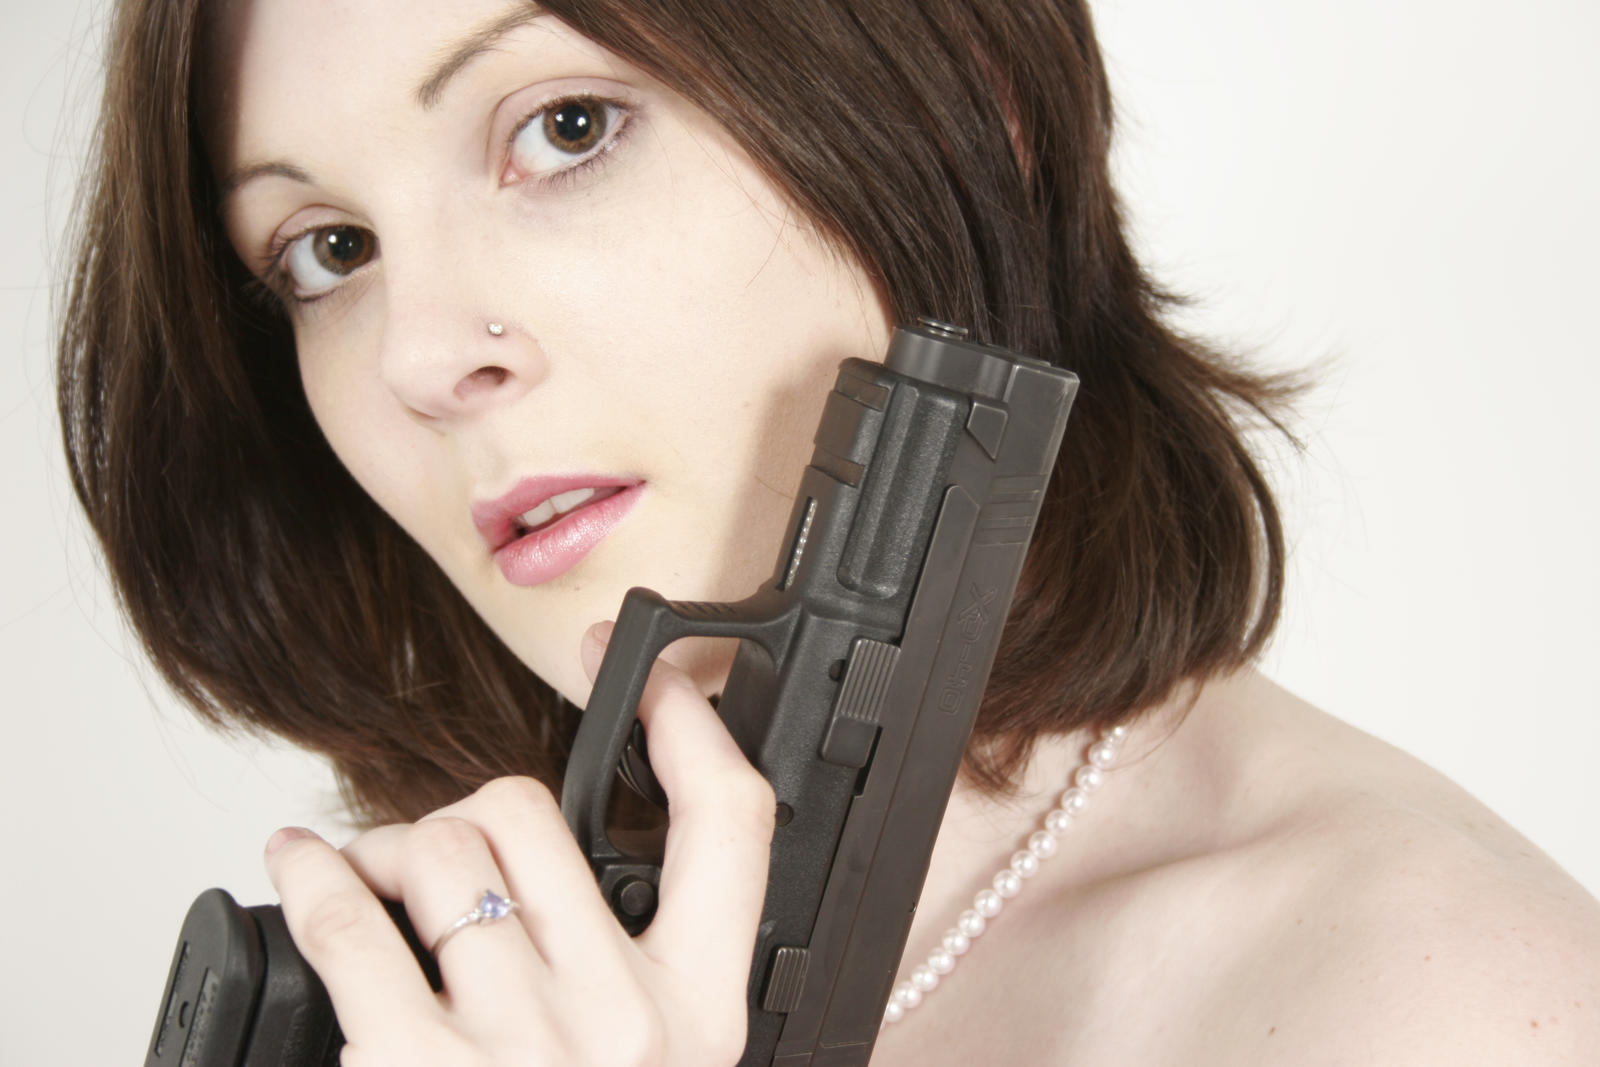 glock glock by vampurity-stock